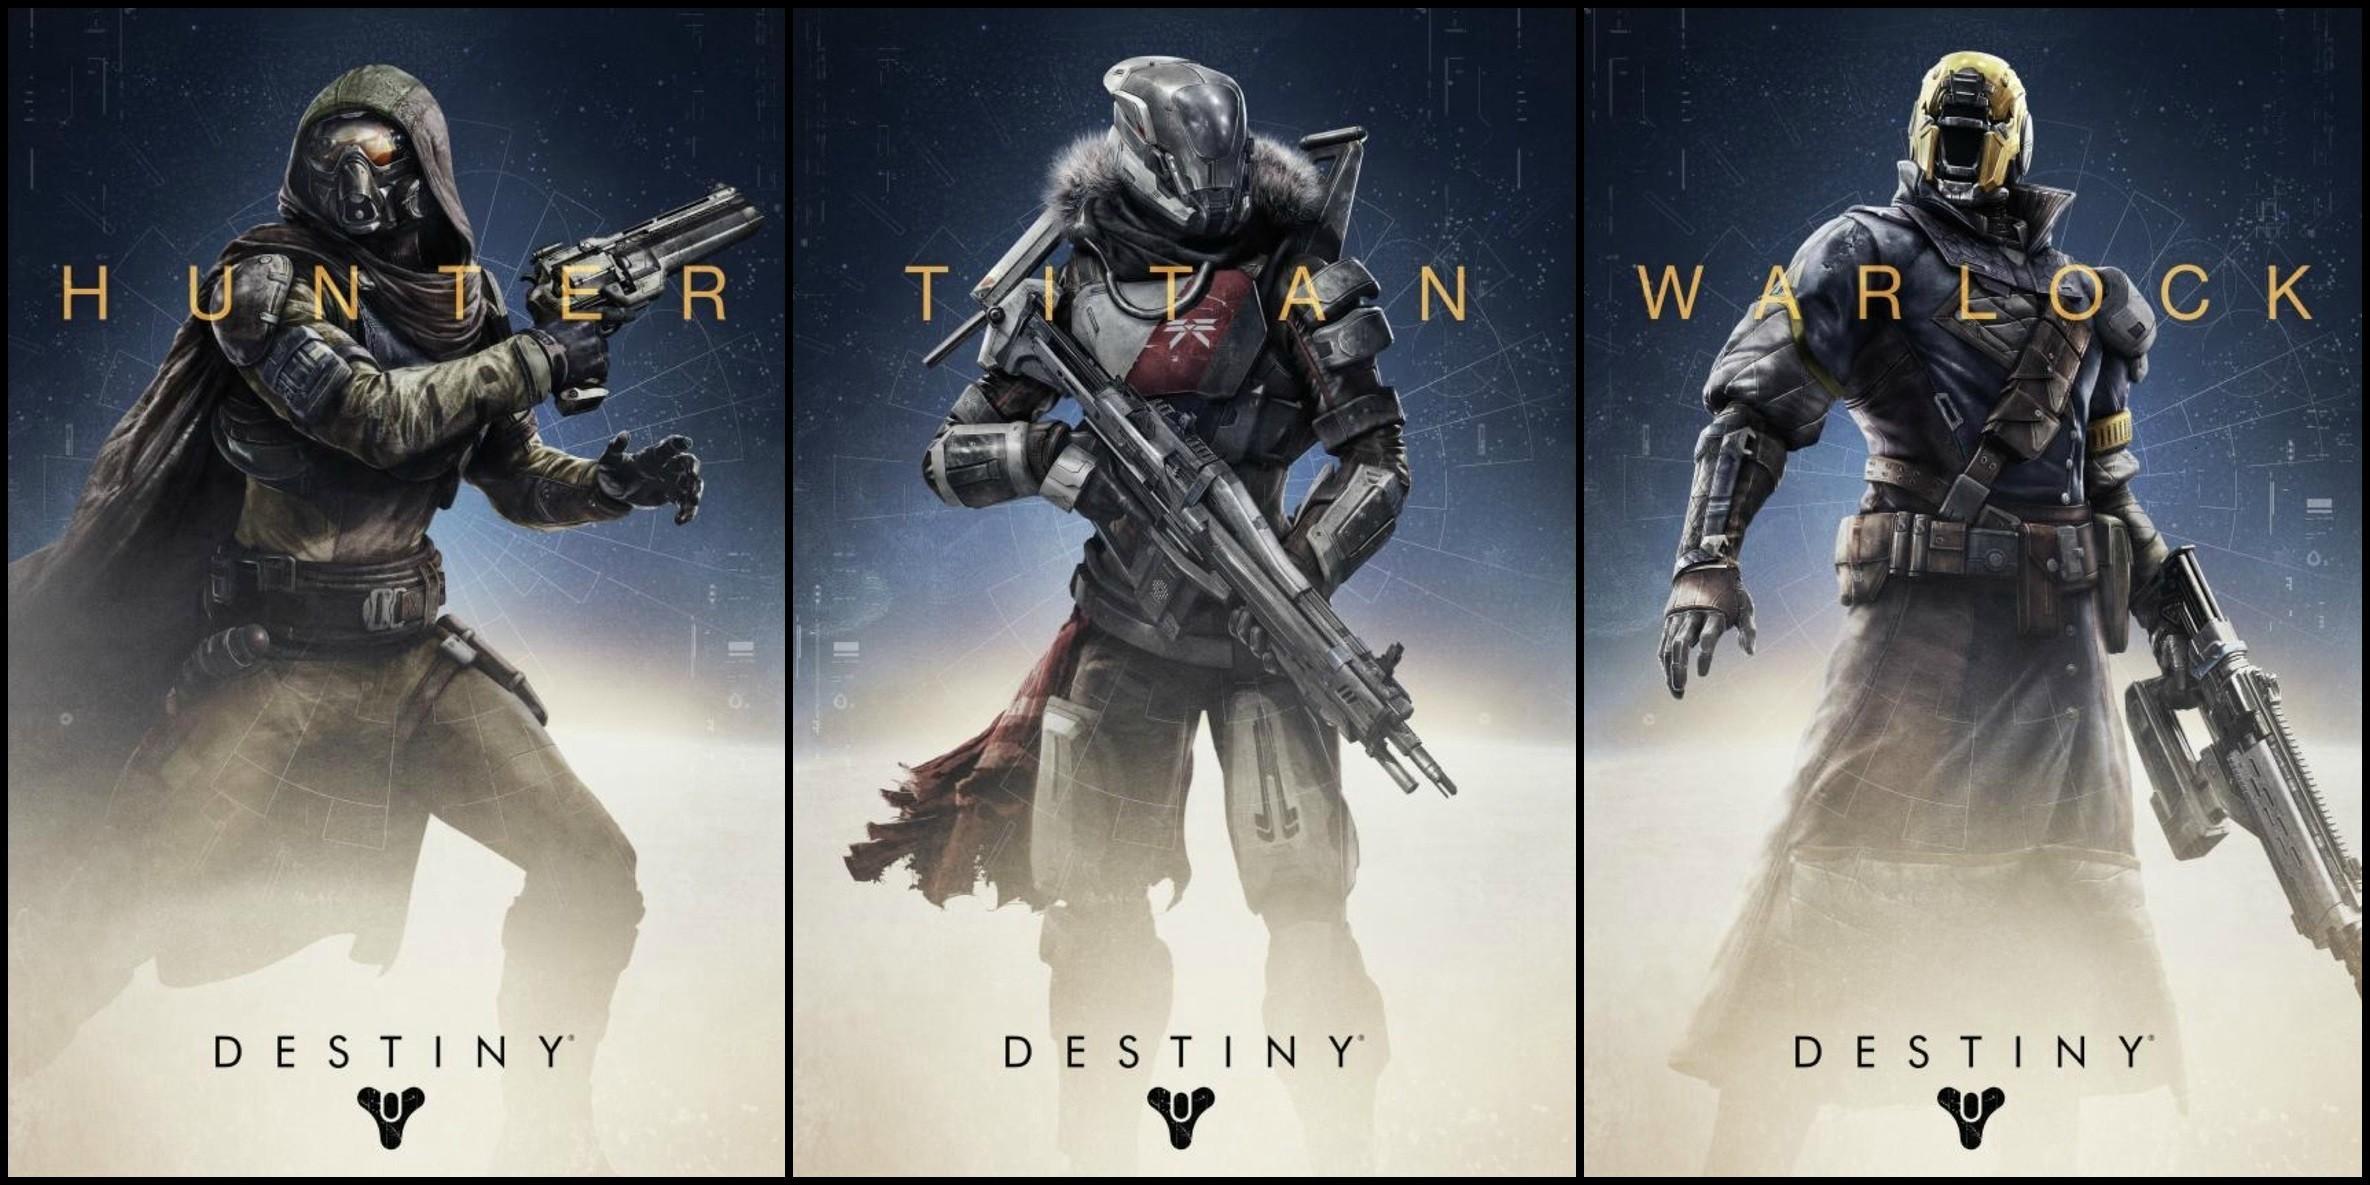 Hunter-Titan-and-Warlock-on-Destiny-Game-2014-